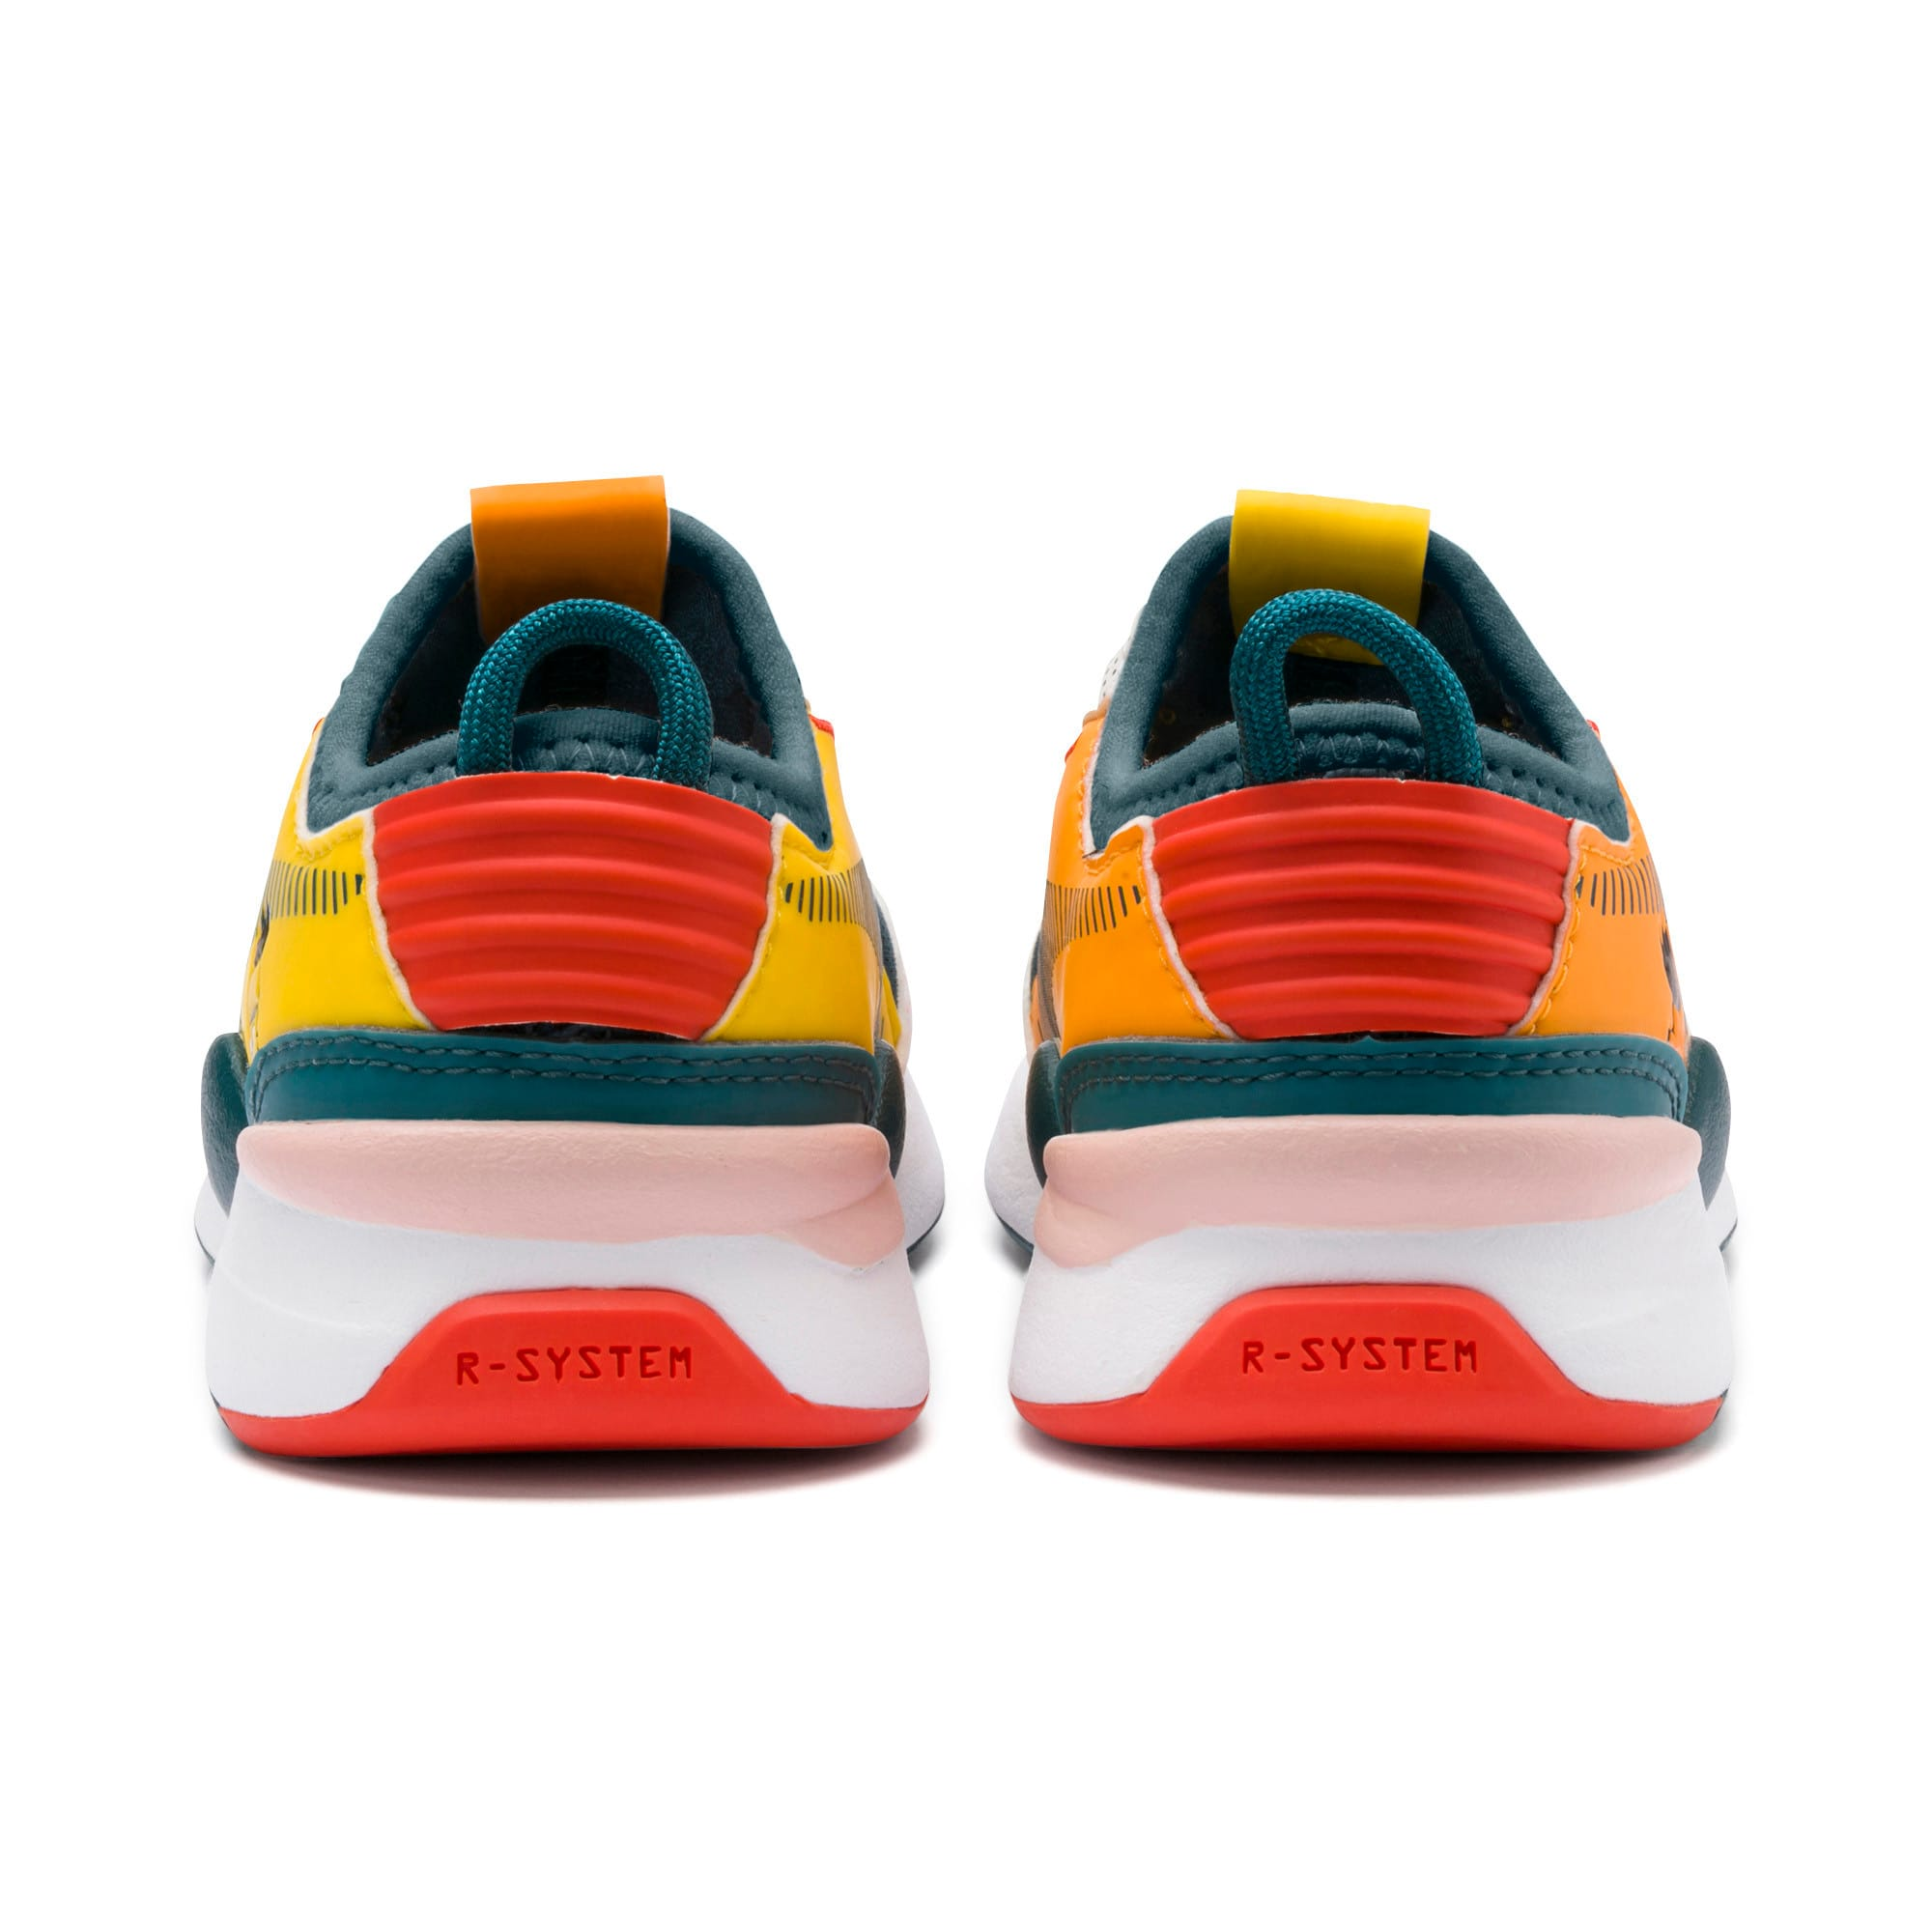 Thumbnail 3 of Sesame Street 50 RS-0 AC Toddler Shoes, Rose-BlueCoral-Dandelion, medium